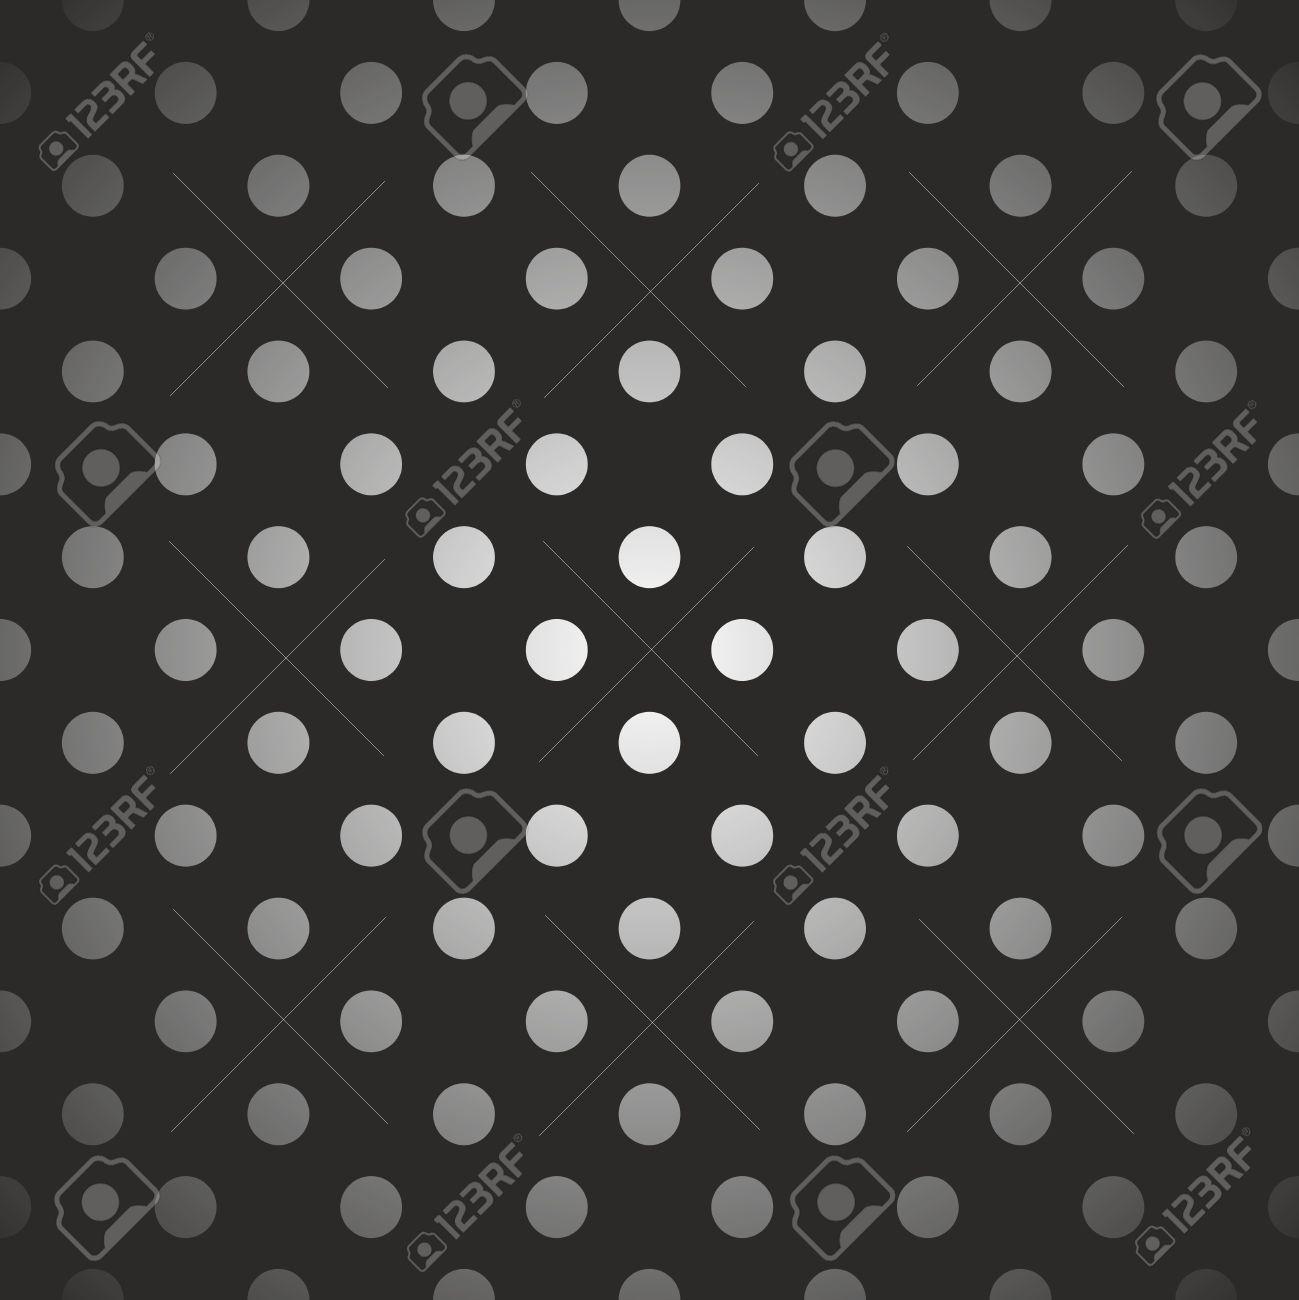 Fantastic Wallpaper Halloween Polka Dot - 34180357-tile-dark-vector-pattern-with-gradient-white-and-grey-polka-dots-on-black-background-for-decoration-  Snapshot_487425.jpg